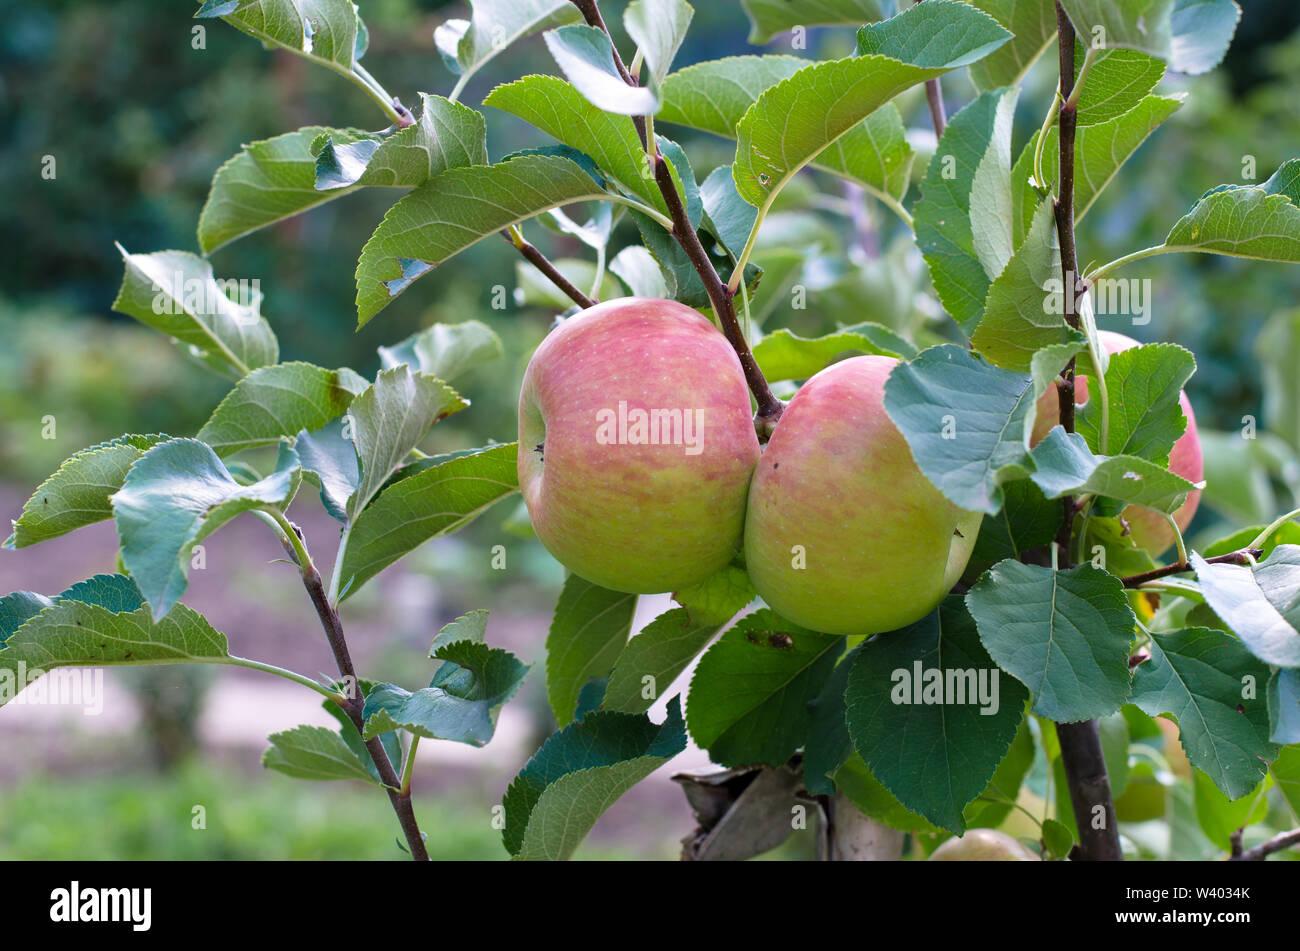 apple fruit in apple tree branch - Stock Image